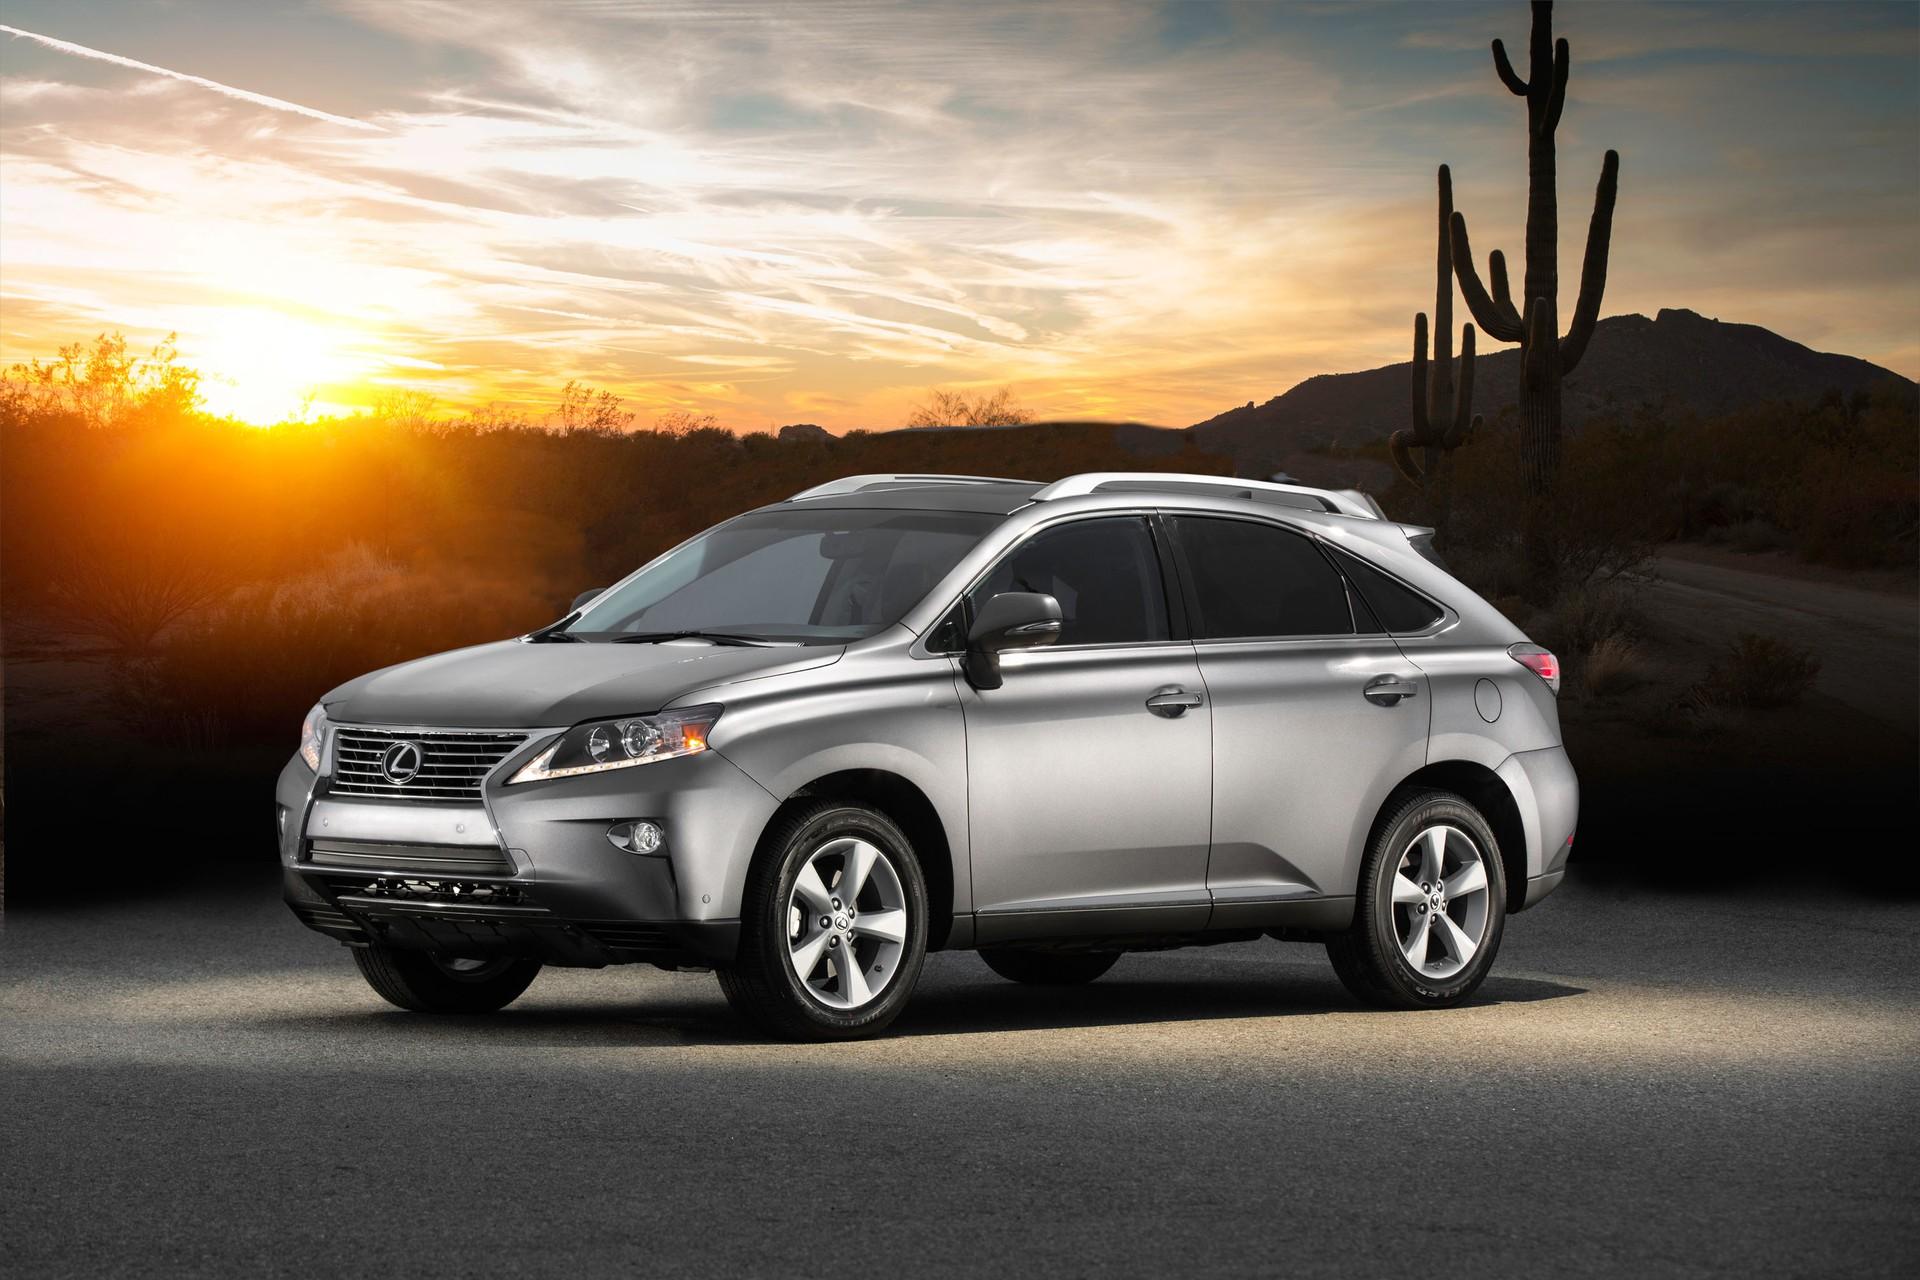 Land Rover Indianapolis >> 2014 Toyota Avalon, Camry, Highlander, Sienna; 2015 Lexus ...